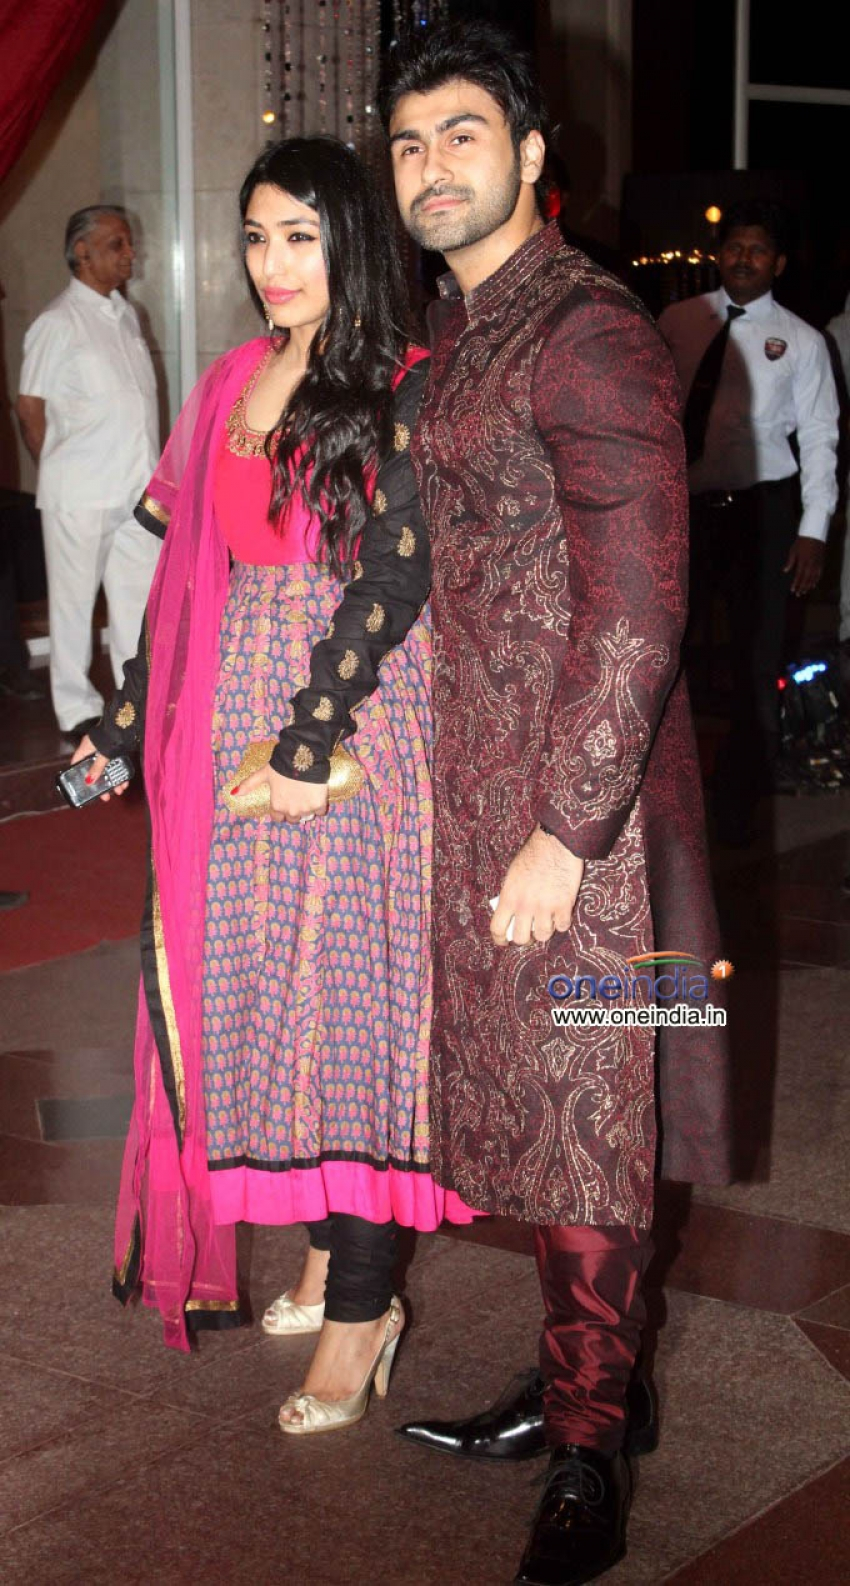 Esha Deol & Bharat Takhtani Sangeet Ceremony Photos